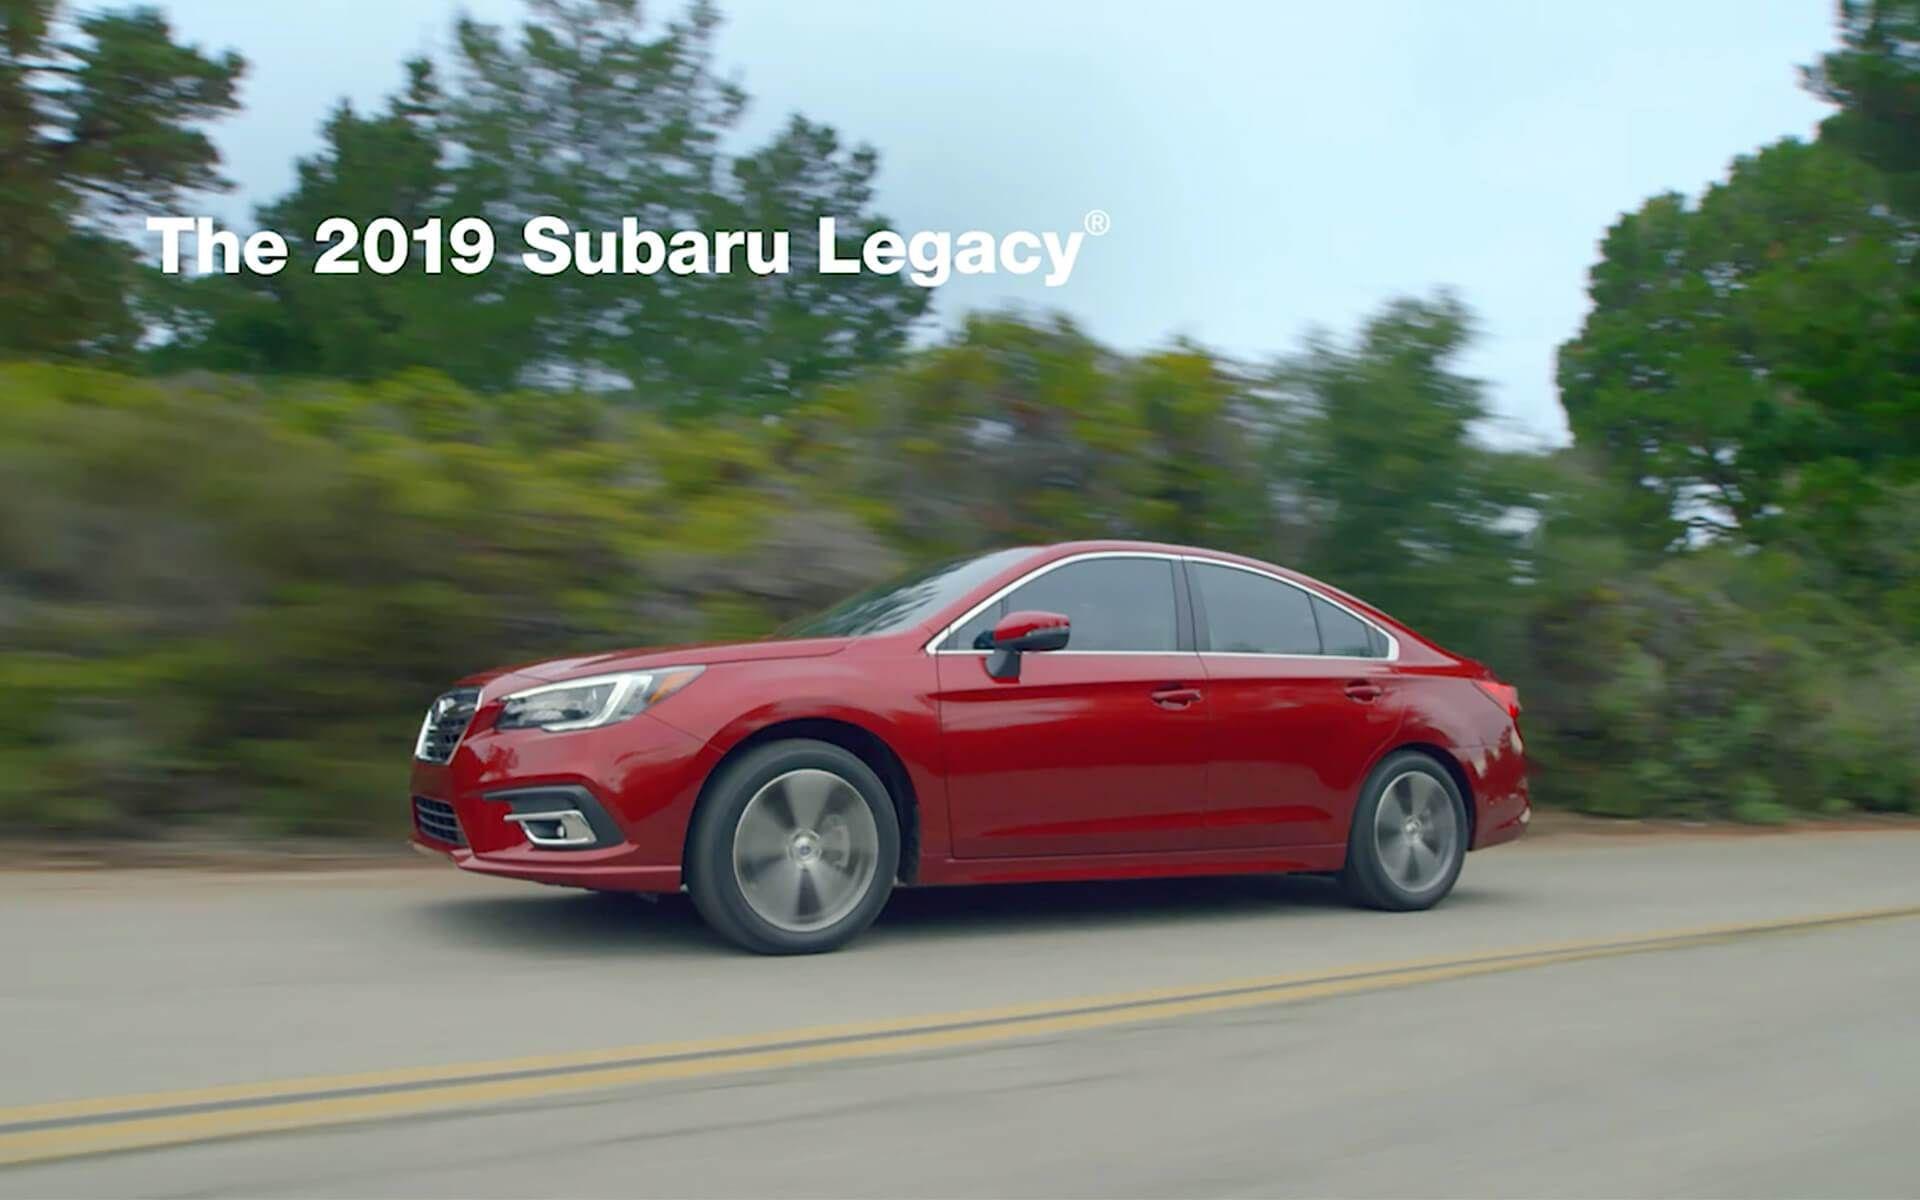 2019 Subaru Legacy Subaru Legacy Subaru Legacy